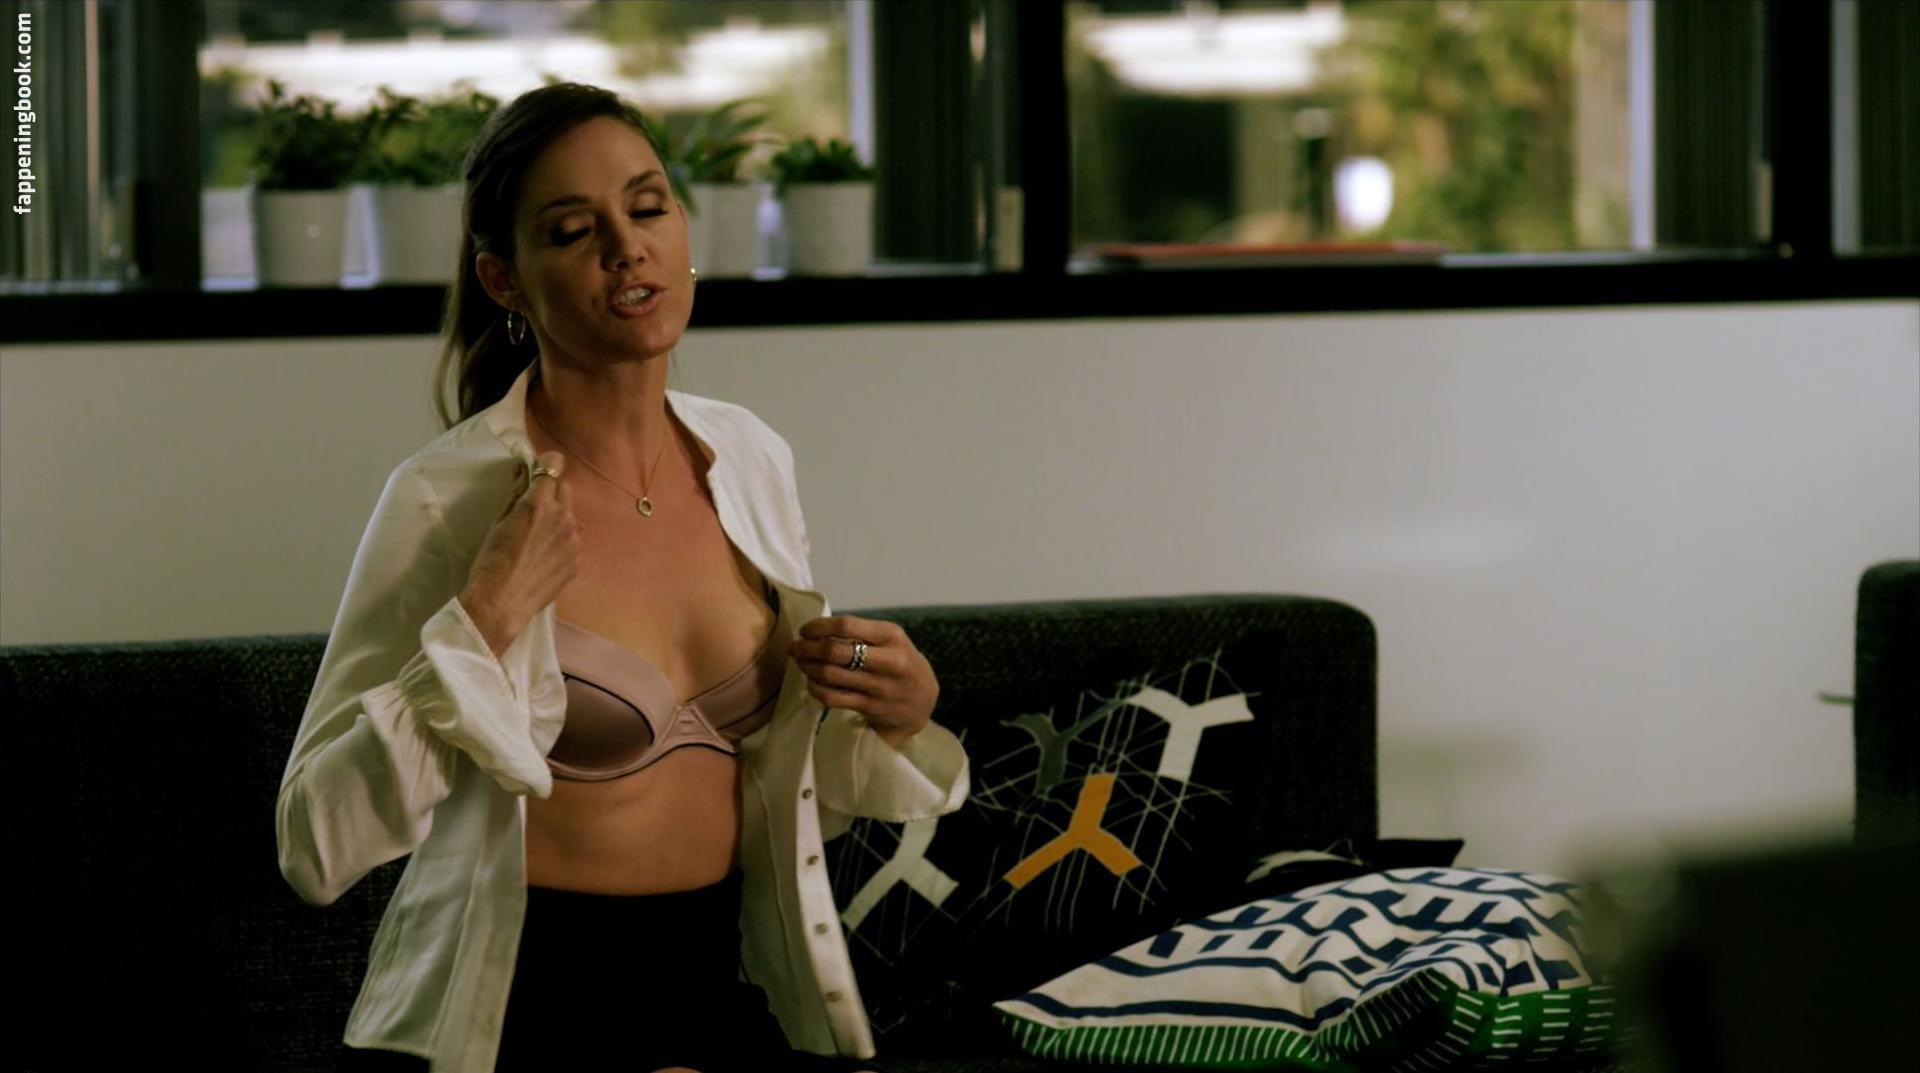 Kate nackt Berlant Cleavage